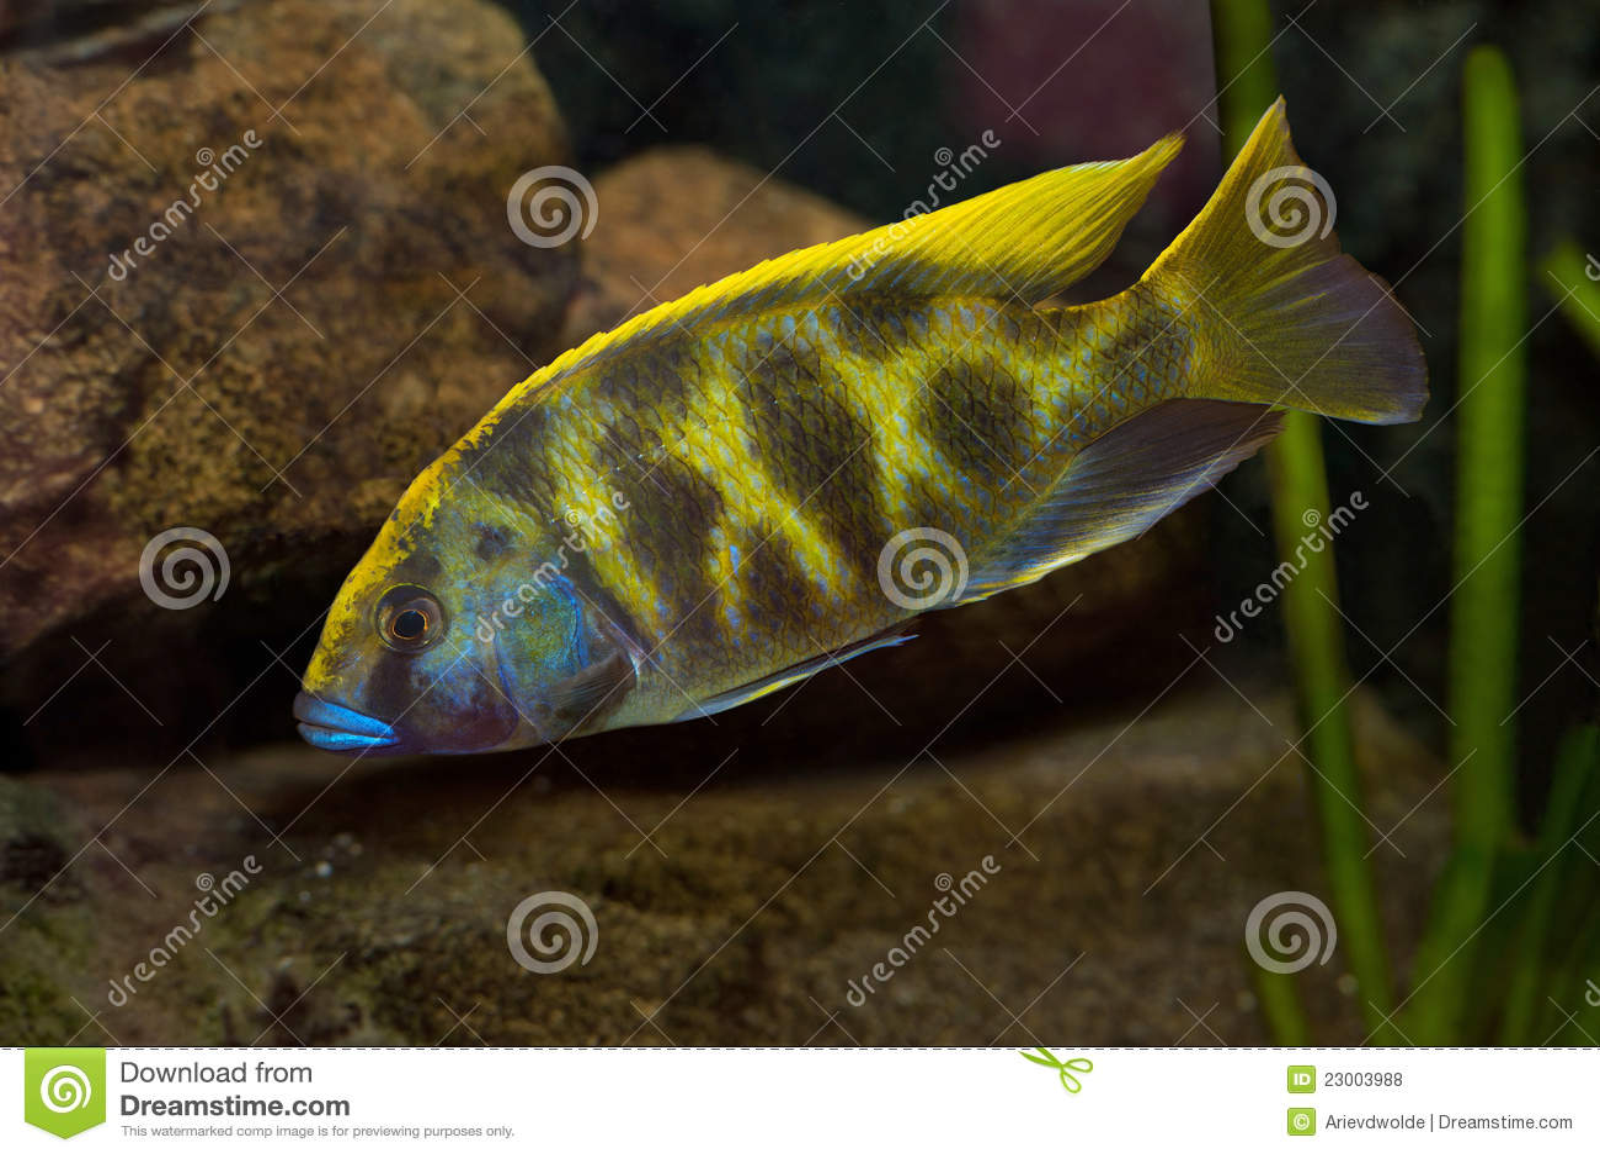 Nimbochromis Venustus In A Fishtank Royalty Free Stock Photos - Image ...